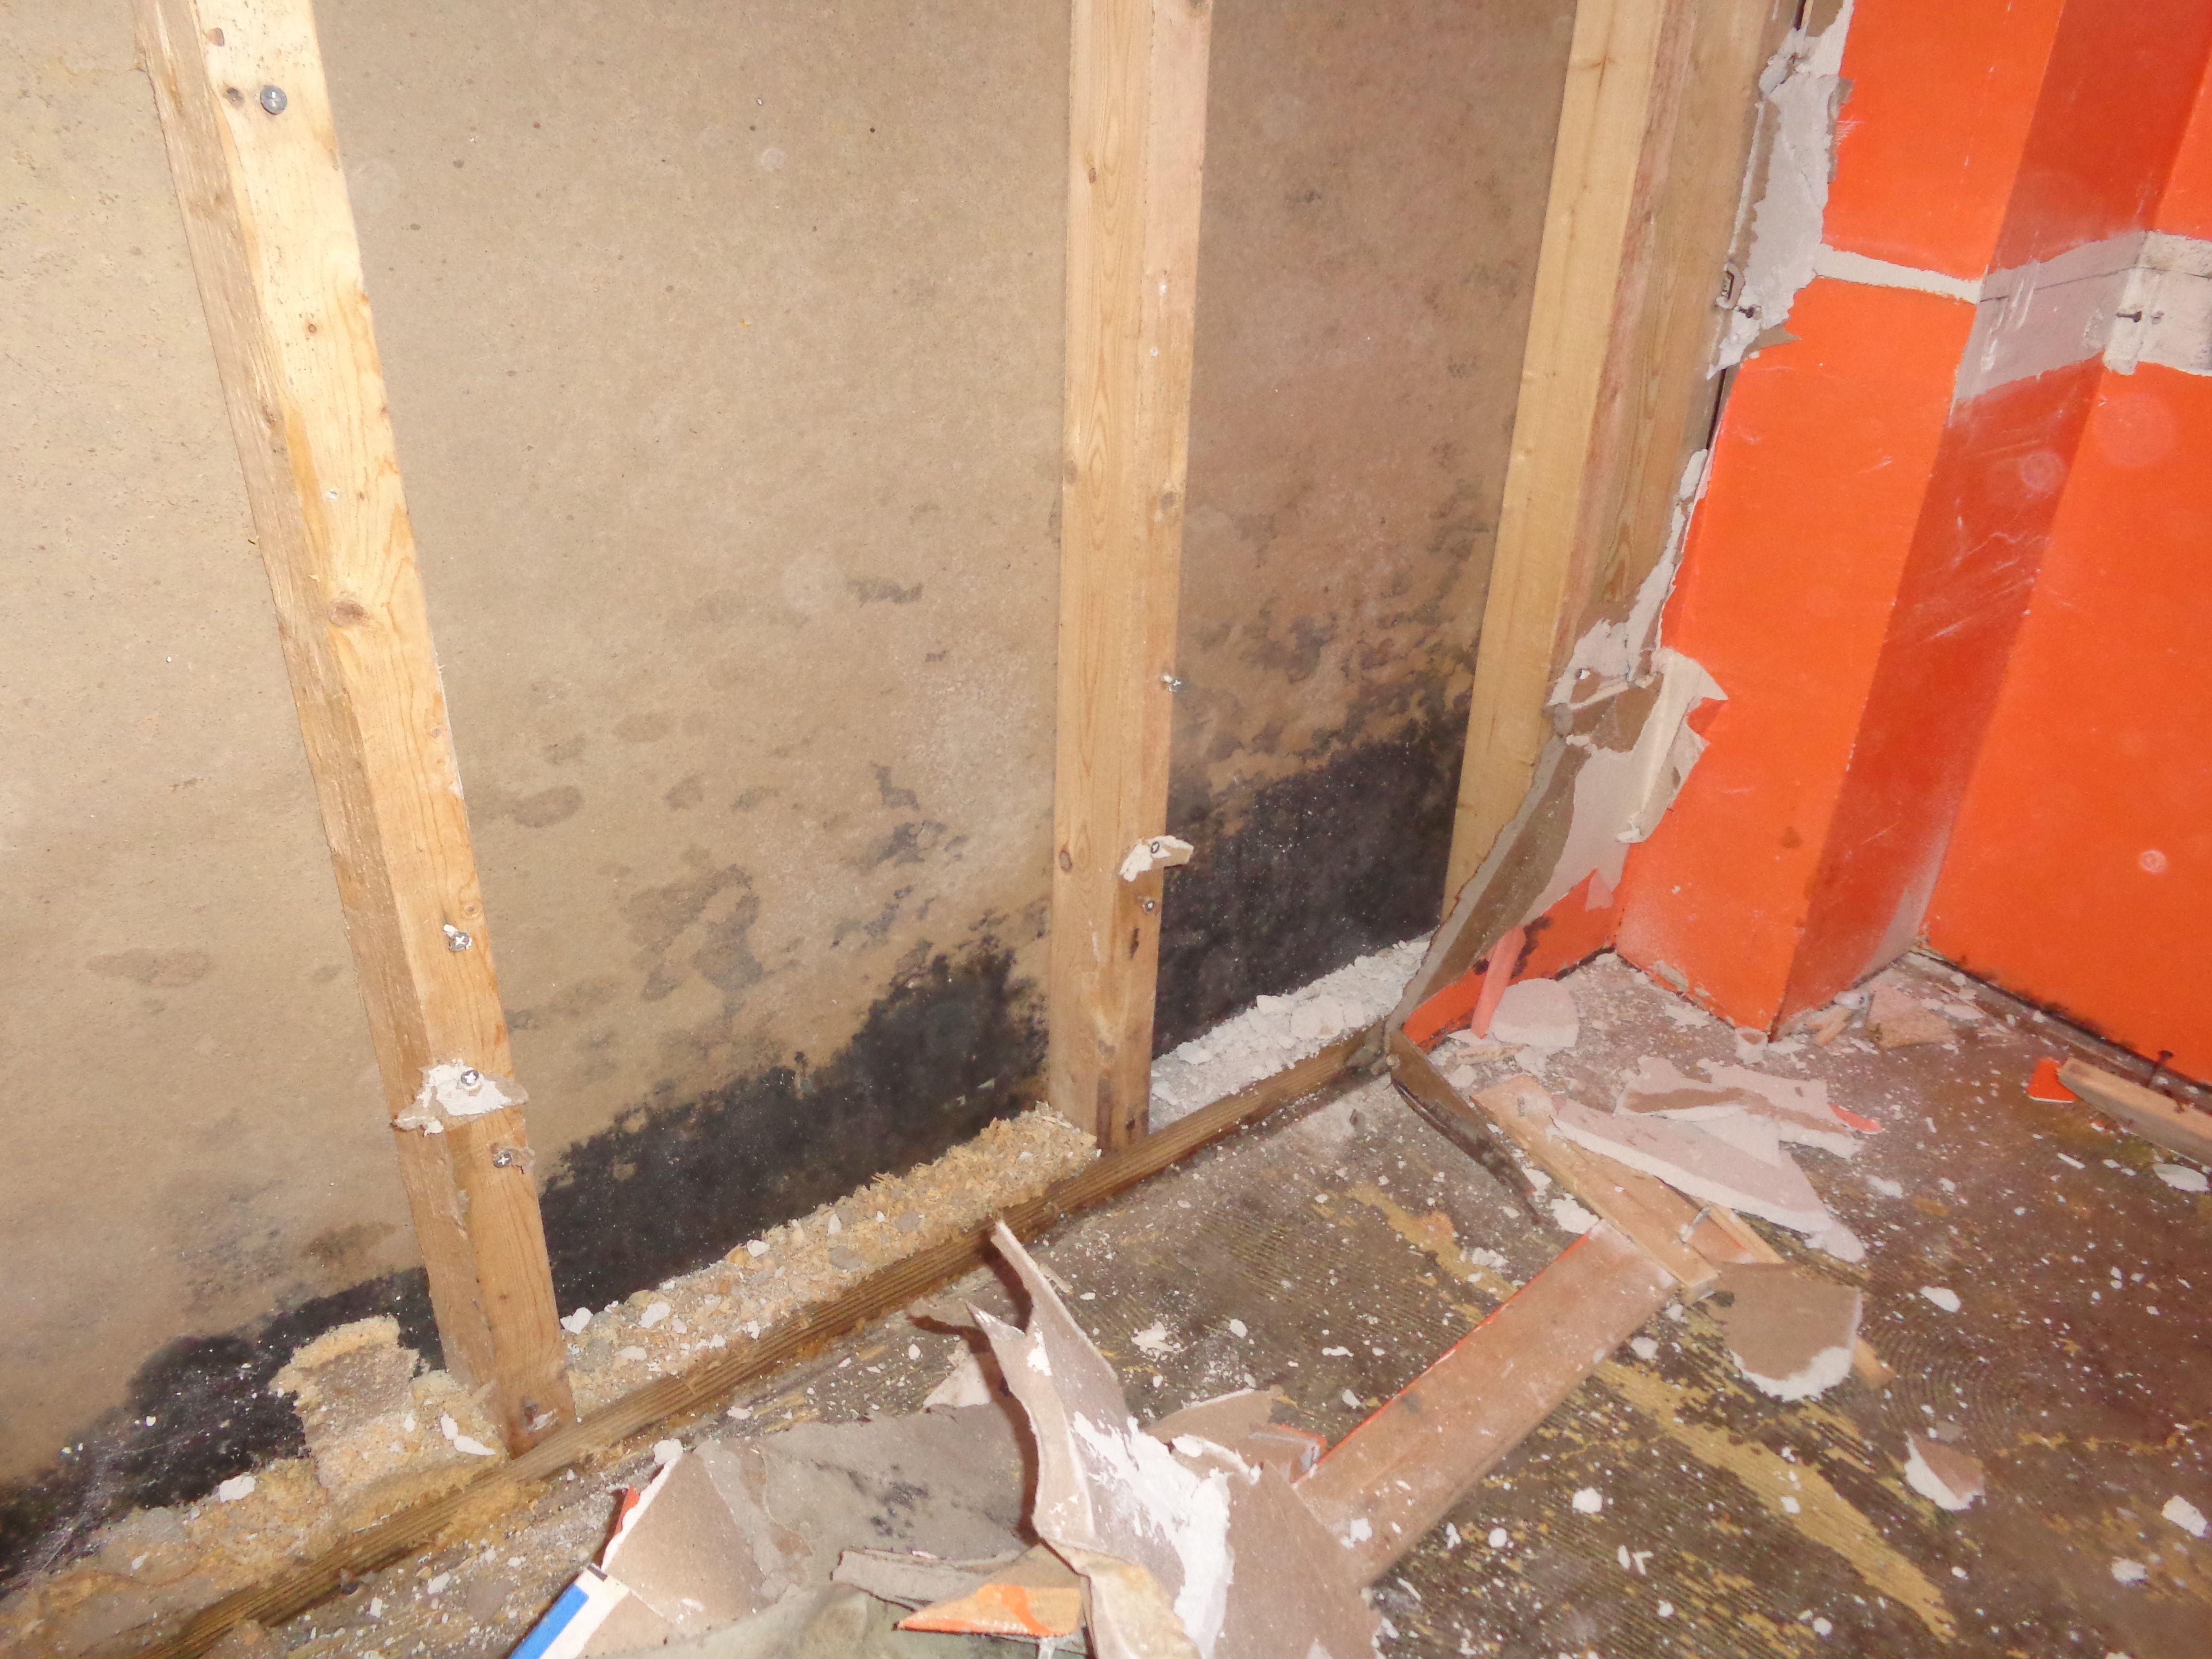 Black mold removal in bensalem pa mold in basement get